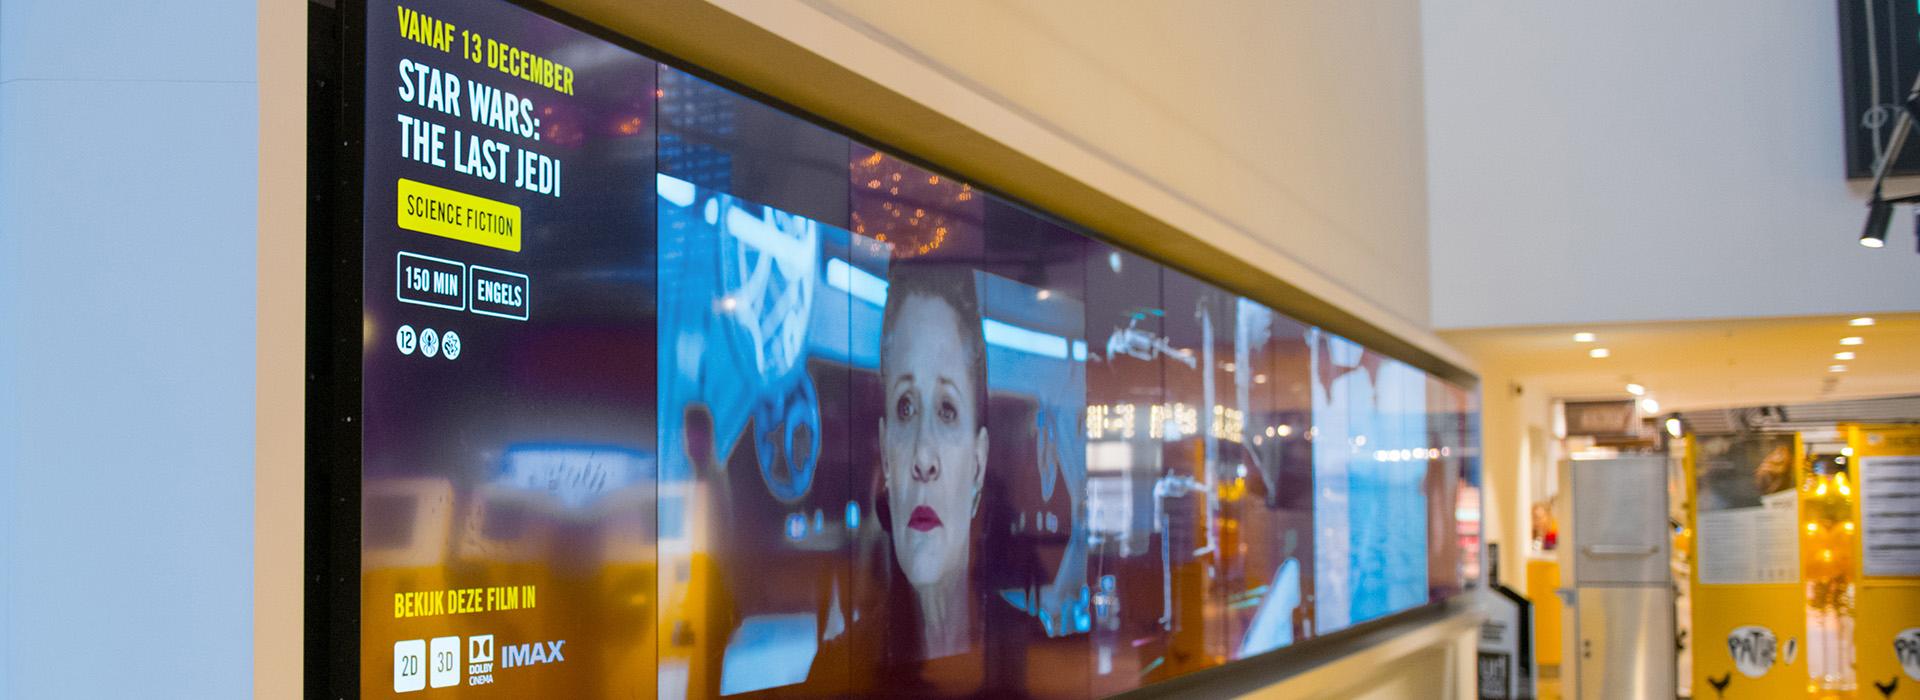 Image of a digital display